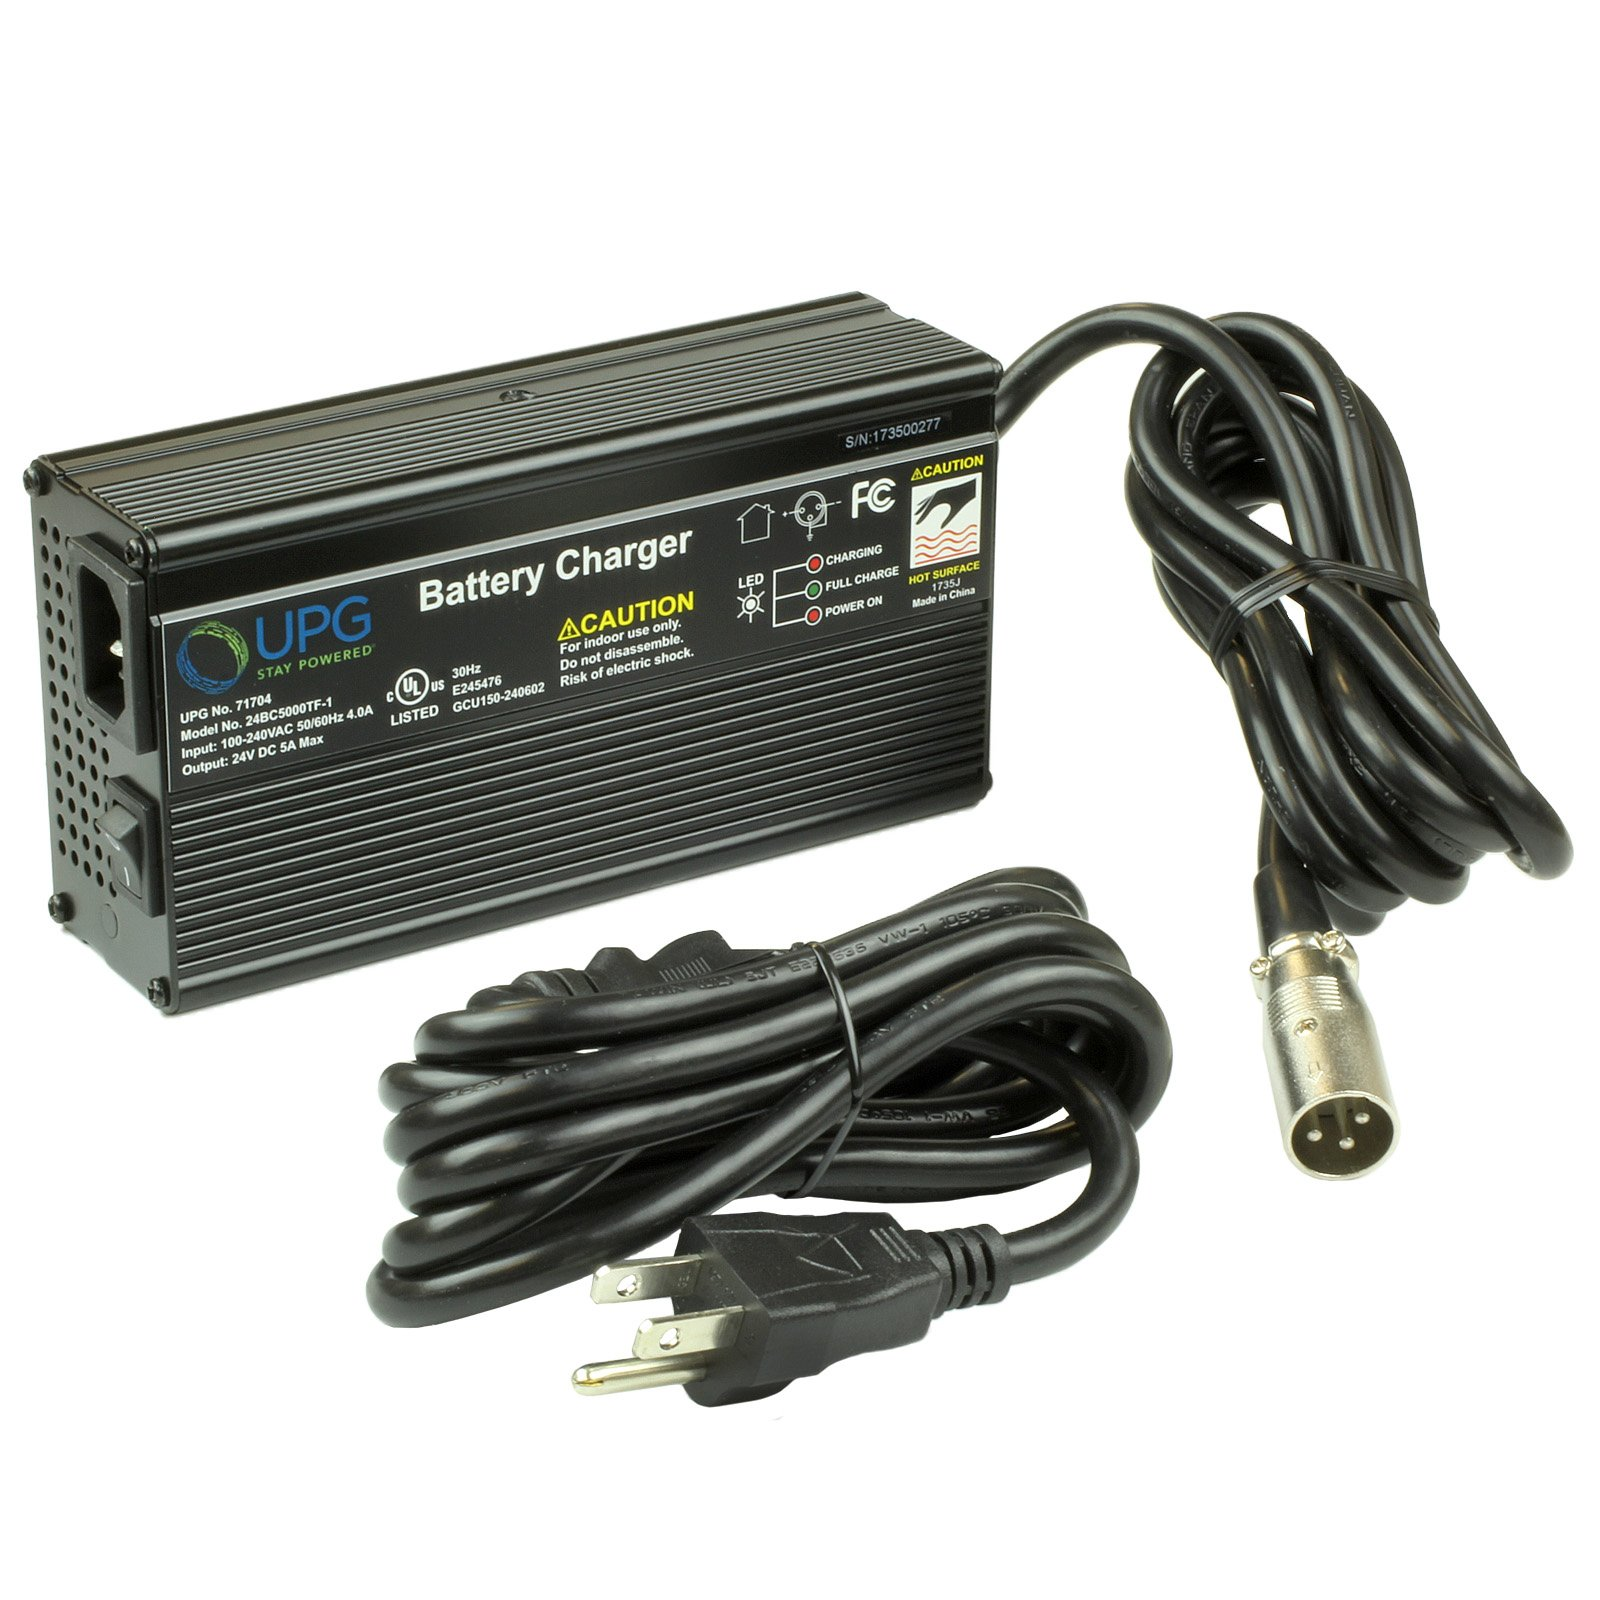 24 volt 5 amp battery charger with xlr connector non cec free rh batterymart com